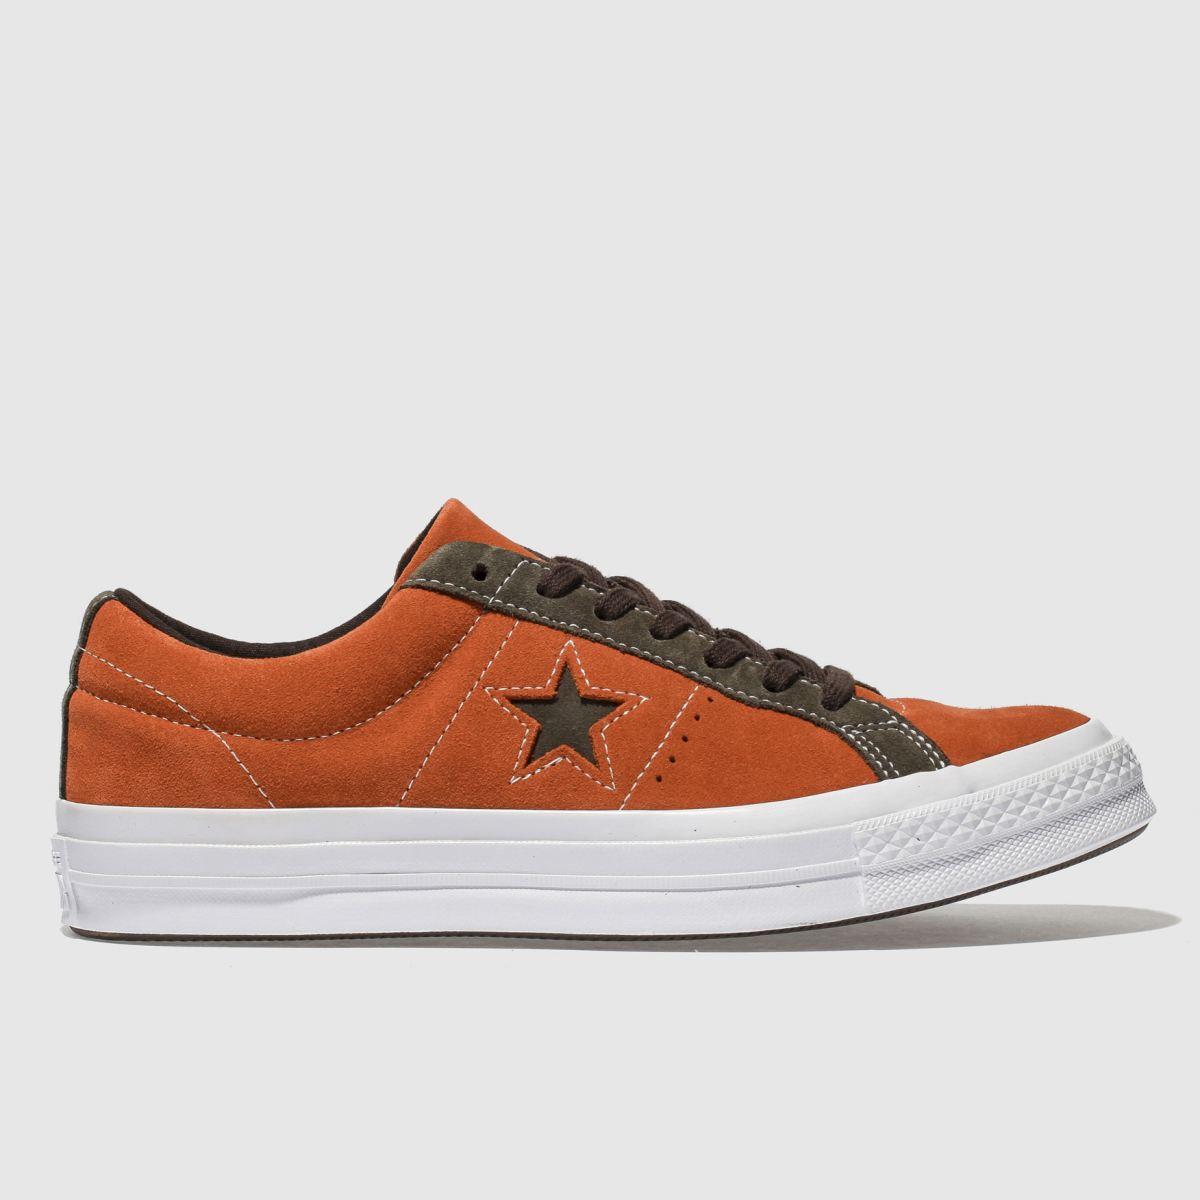 Converse Orange One Star Ox Trainers